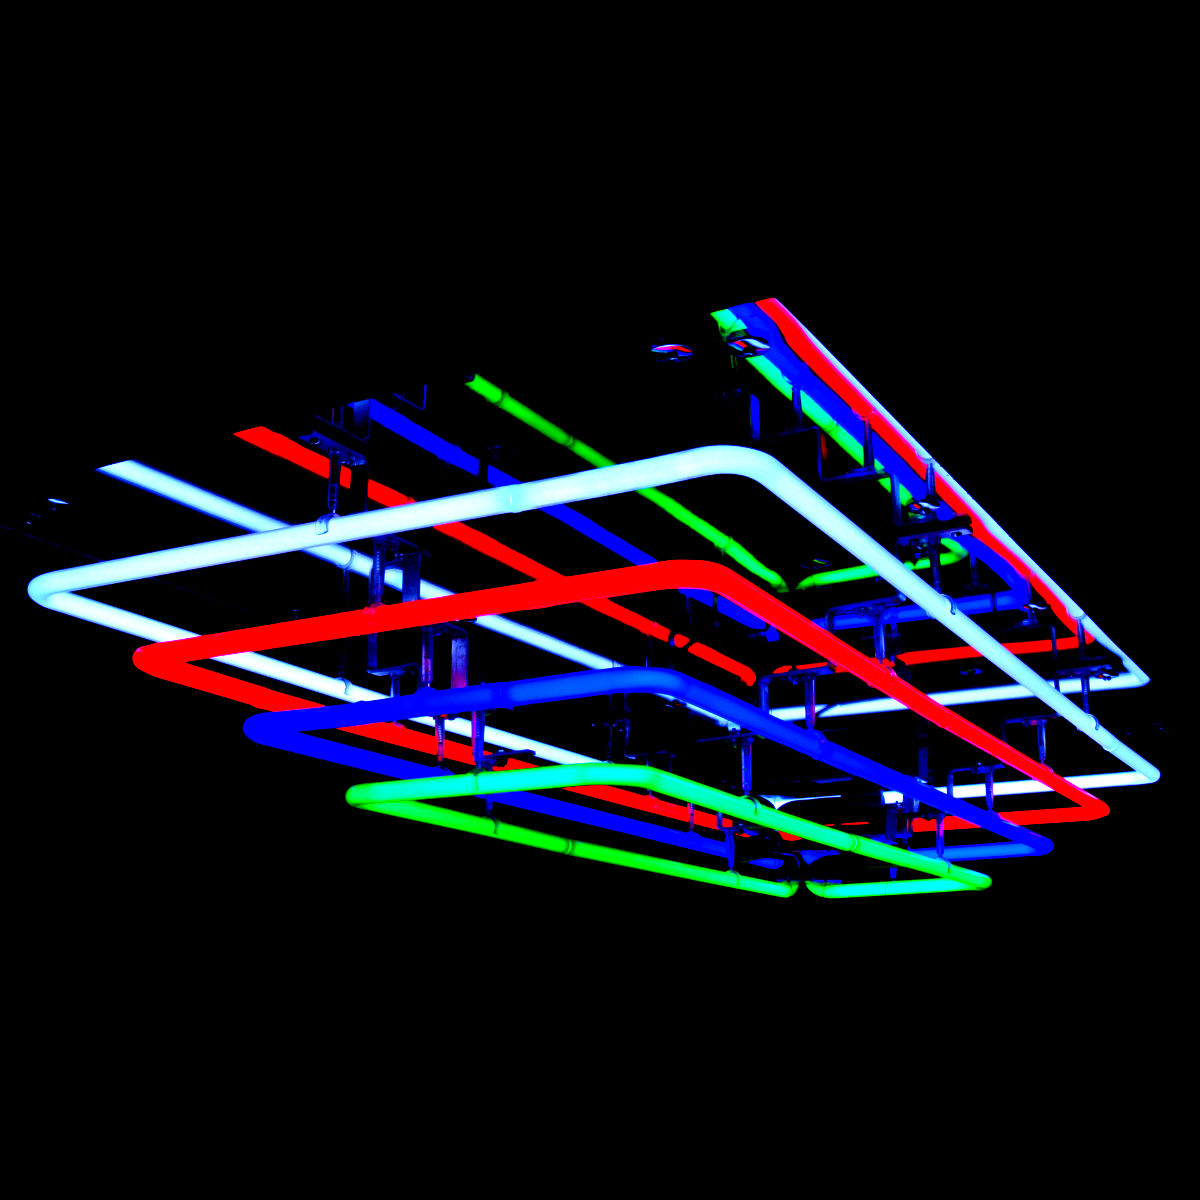 Designer Custom Hand-blown Neon Light Fixtures by John Barton - BartonNeonMagic.com